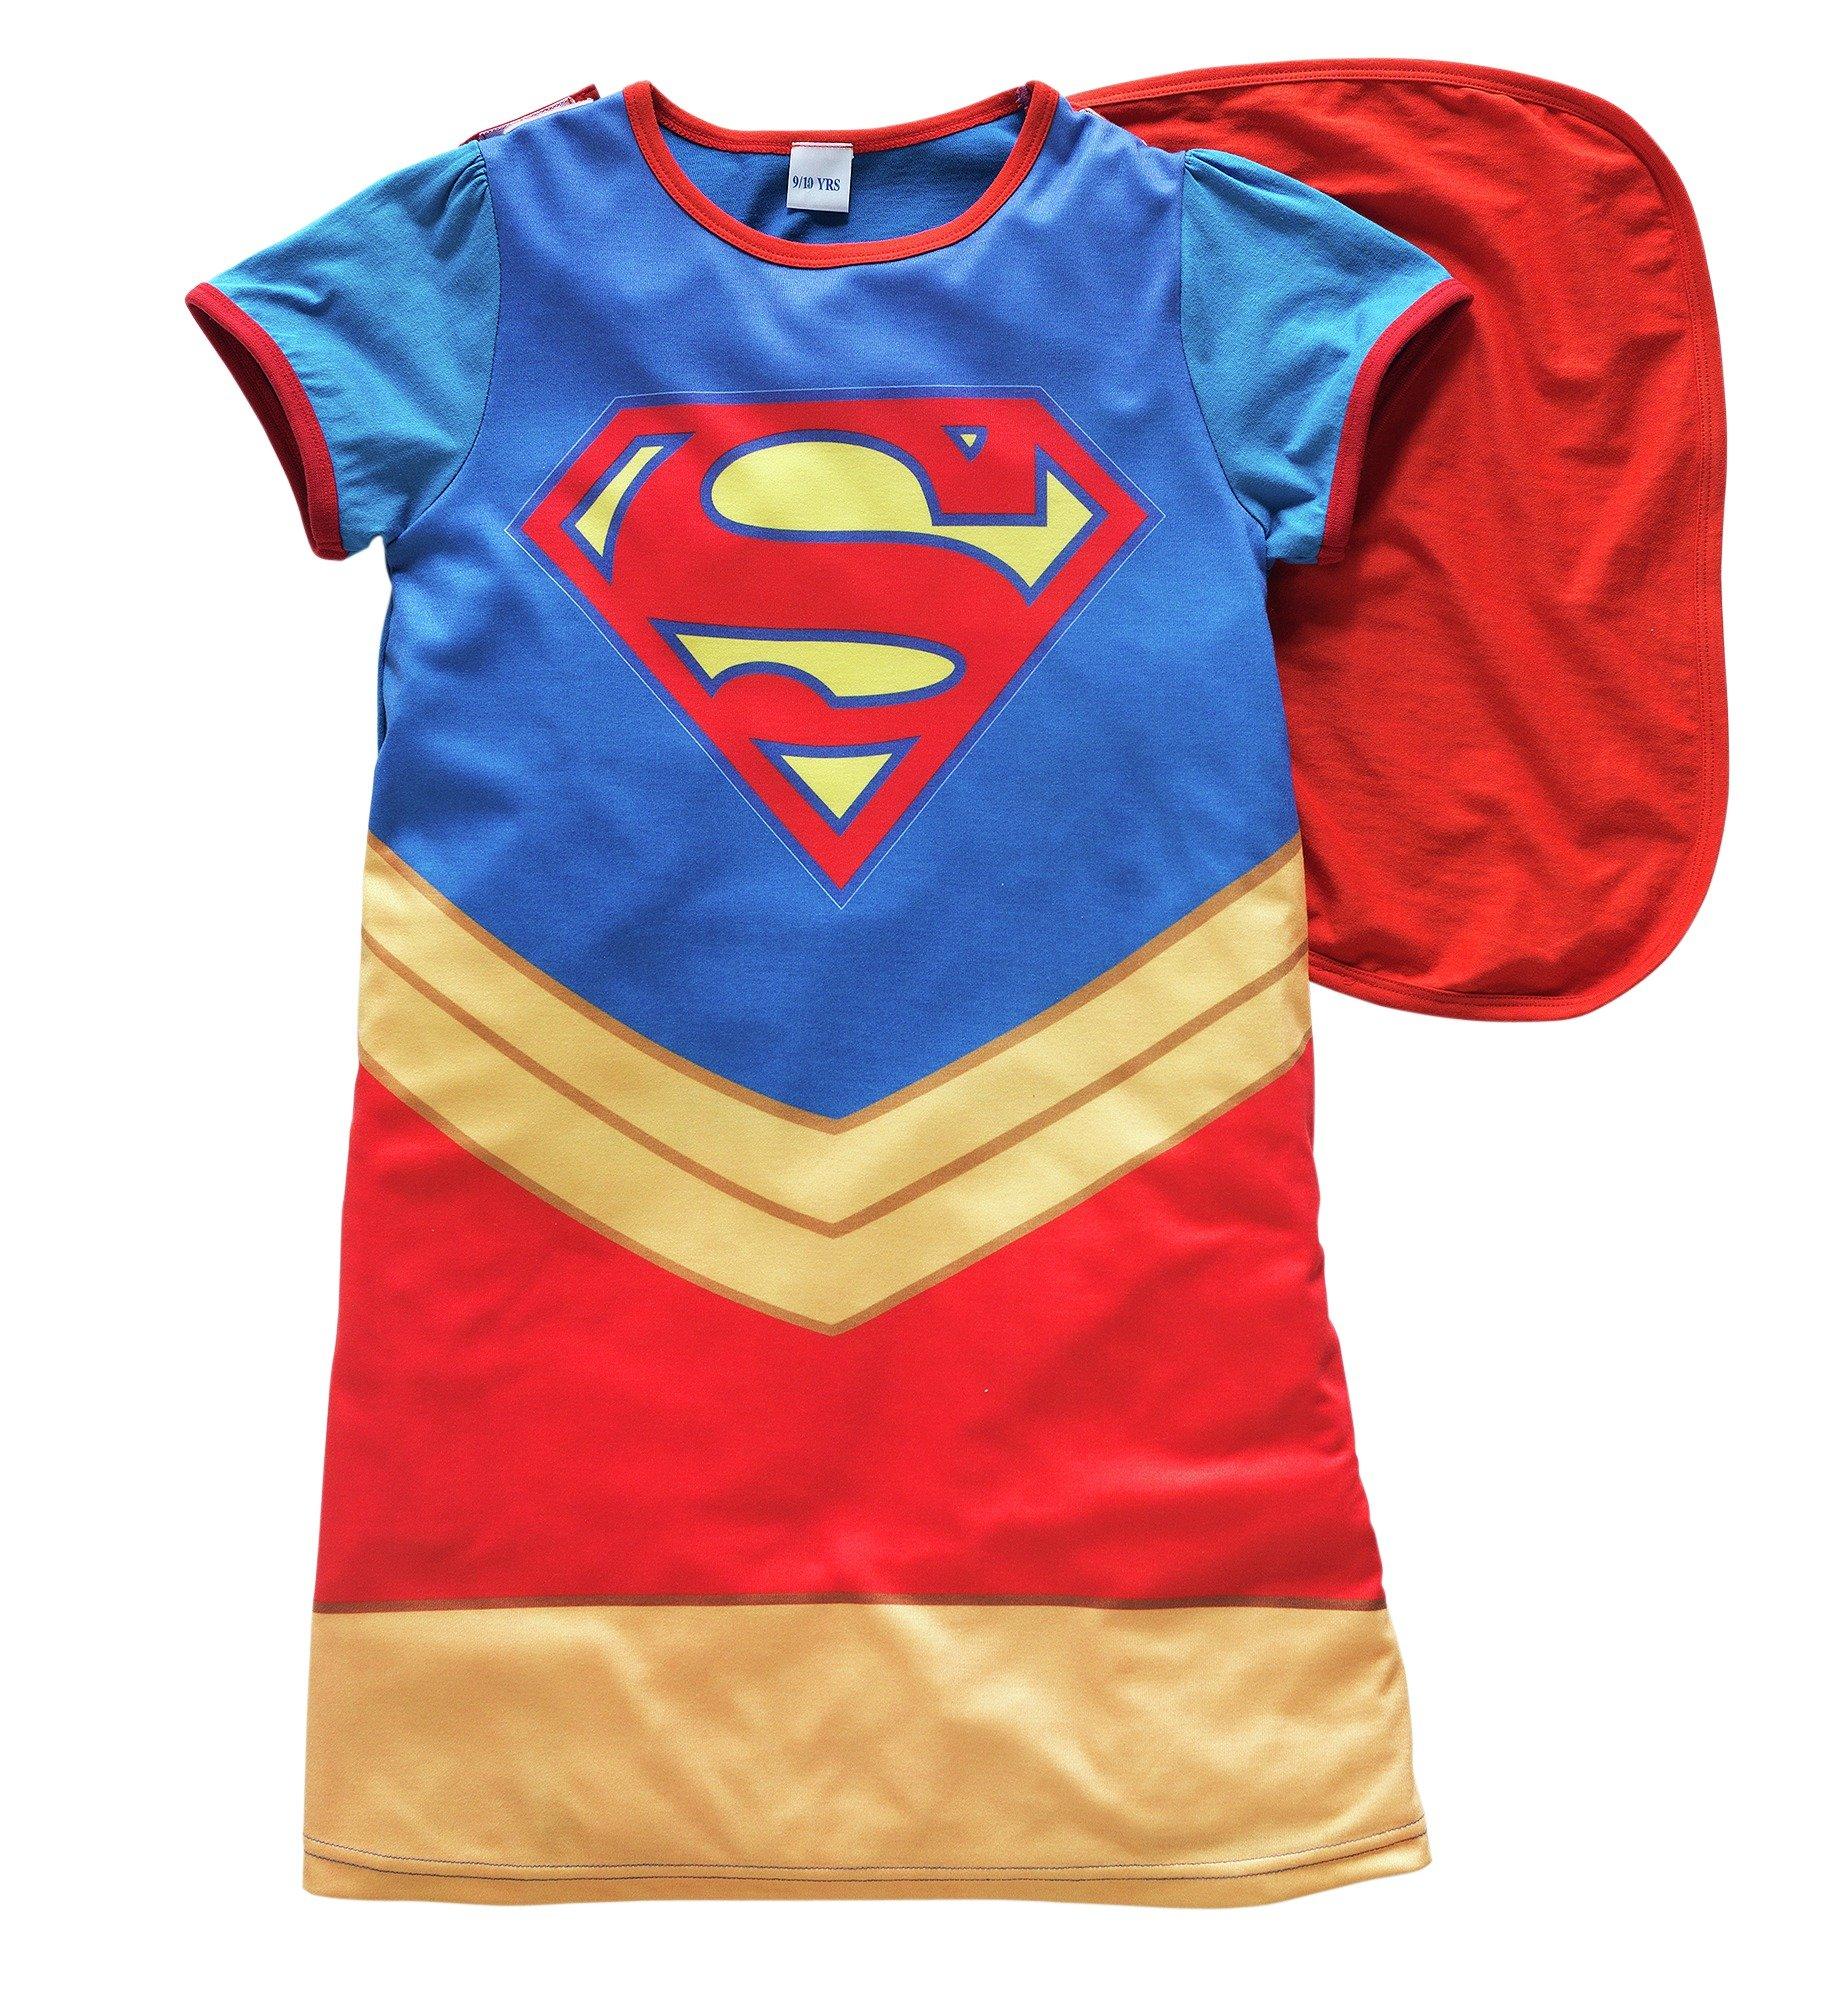 Image of DC Supergirl Nightie - 7-8 Years